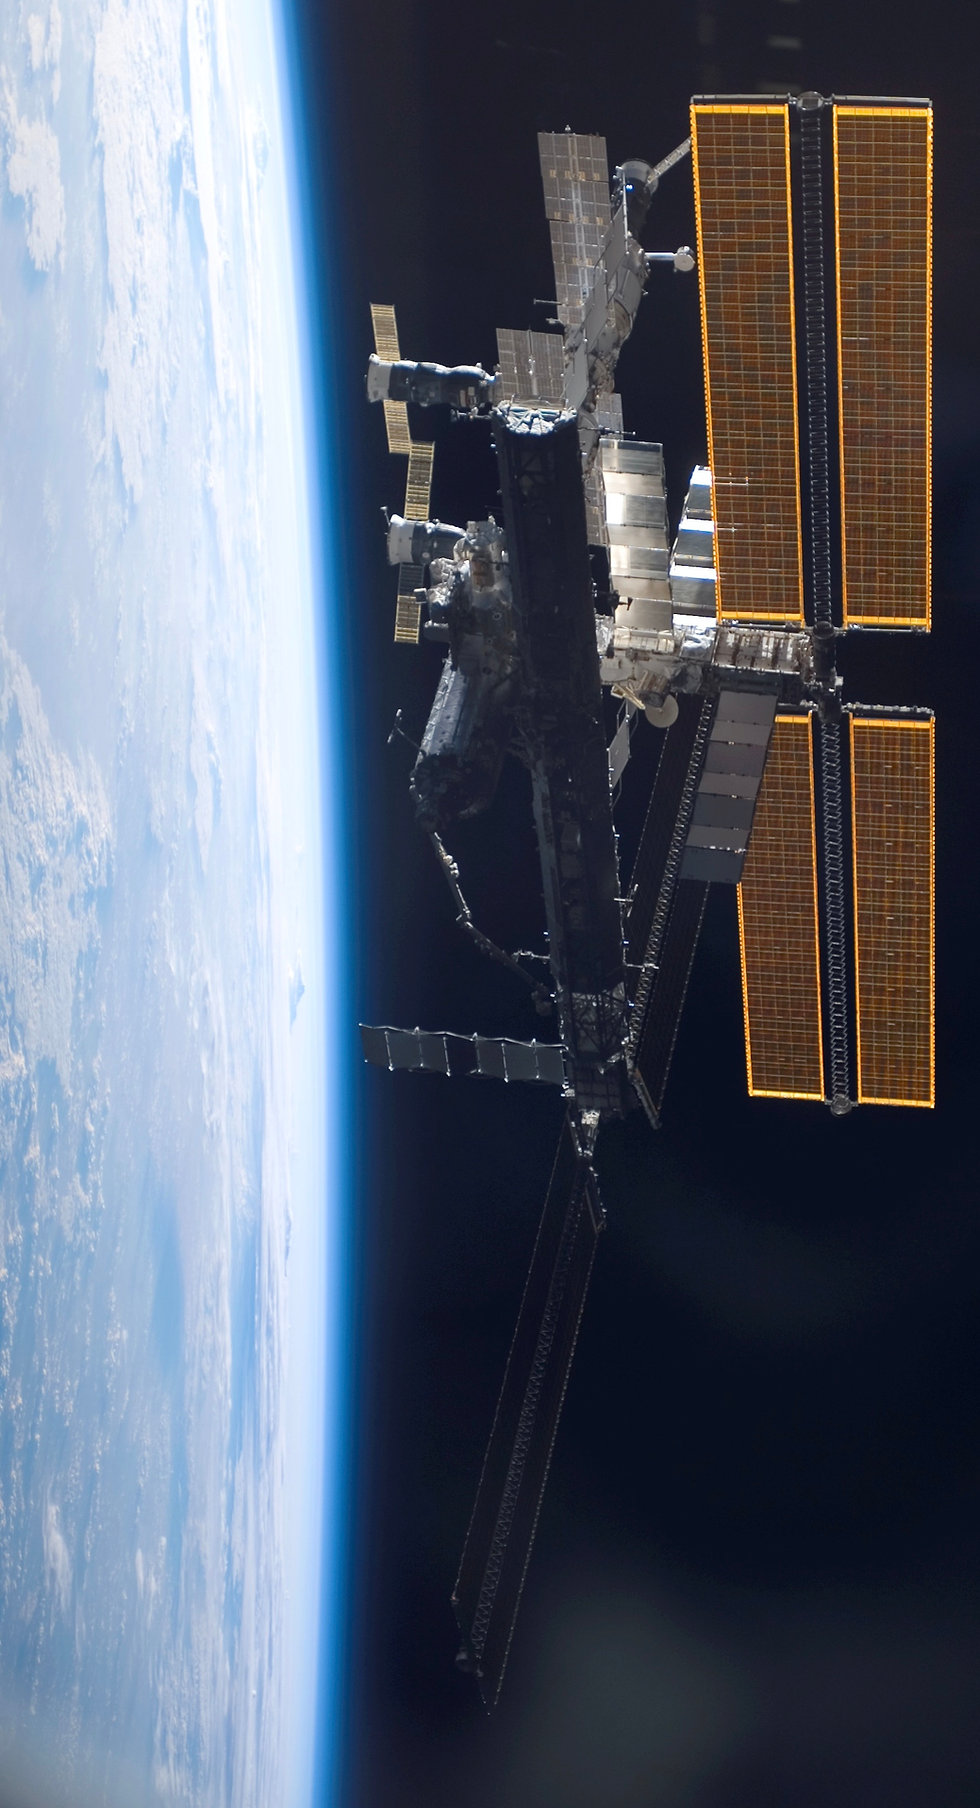 ISS_orbit.jpg